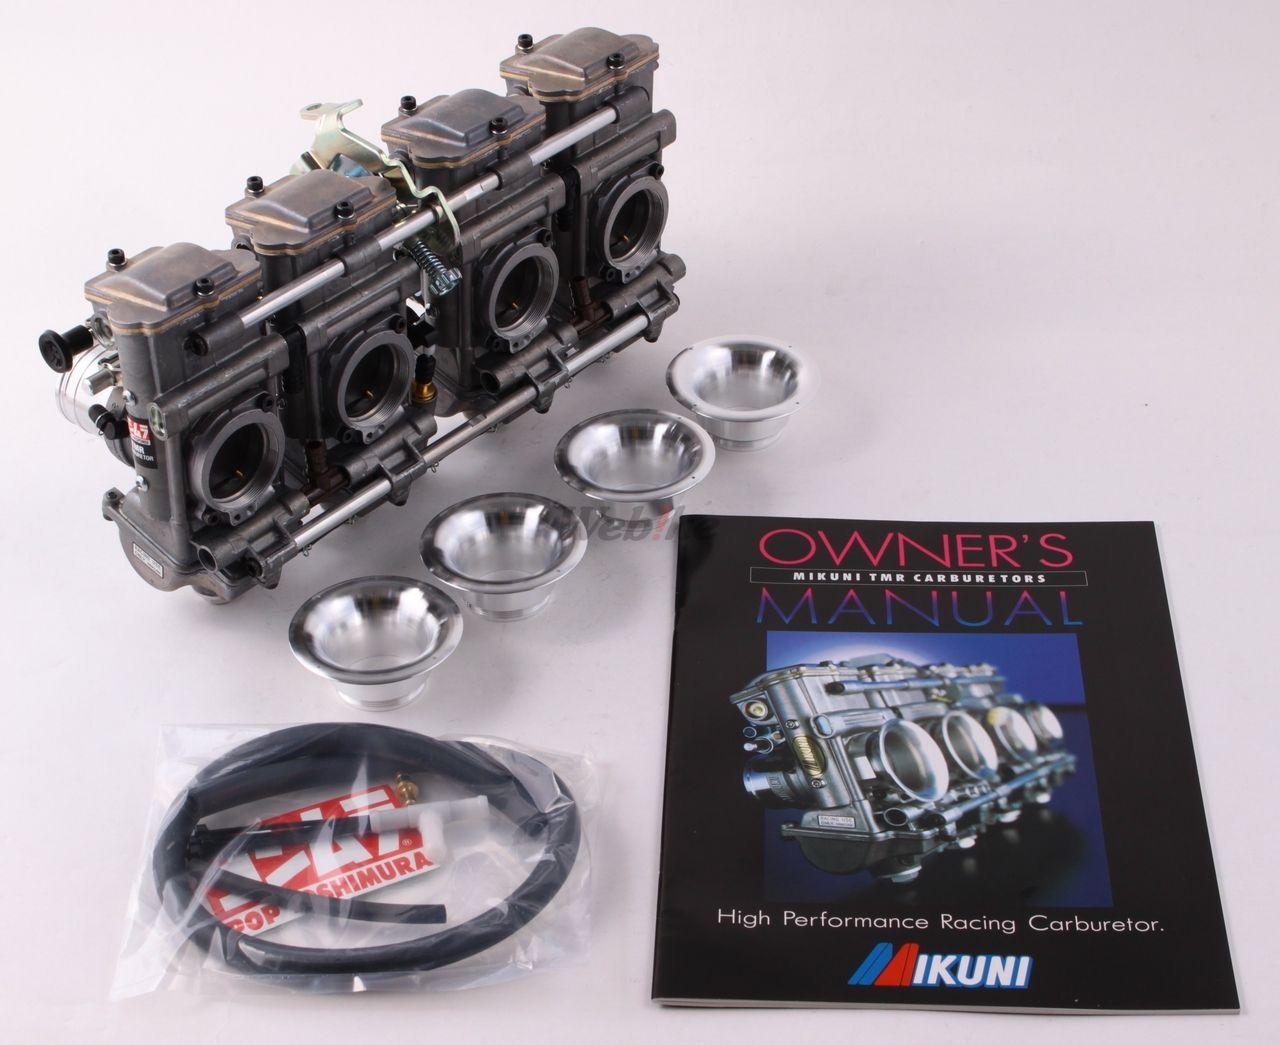 【YOSHIMURA】MikuniTMR32化油器組 - 「Webike-摩托百貨」